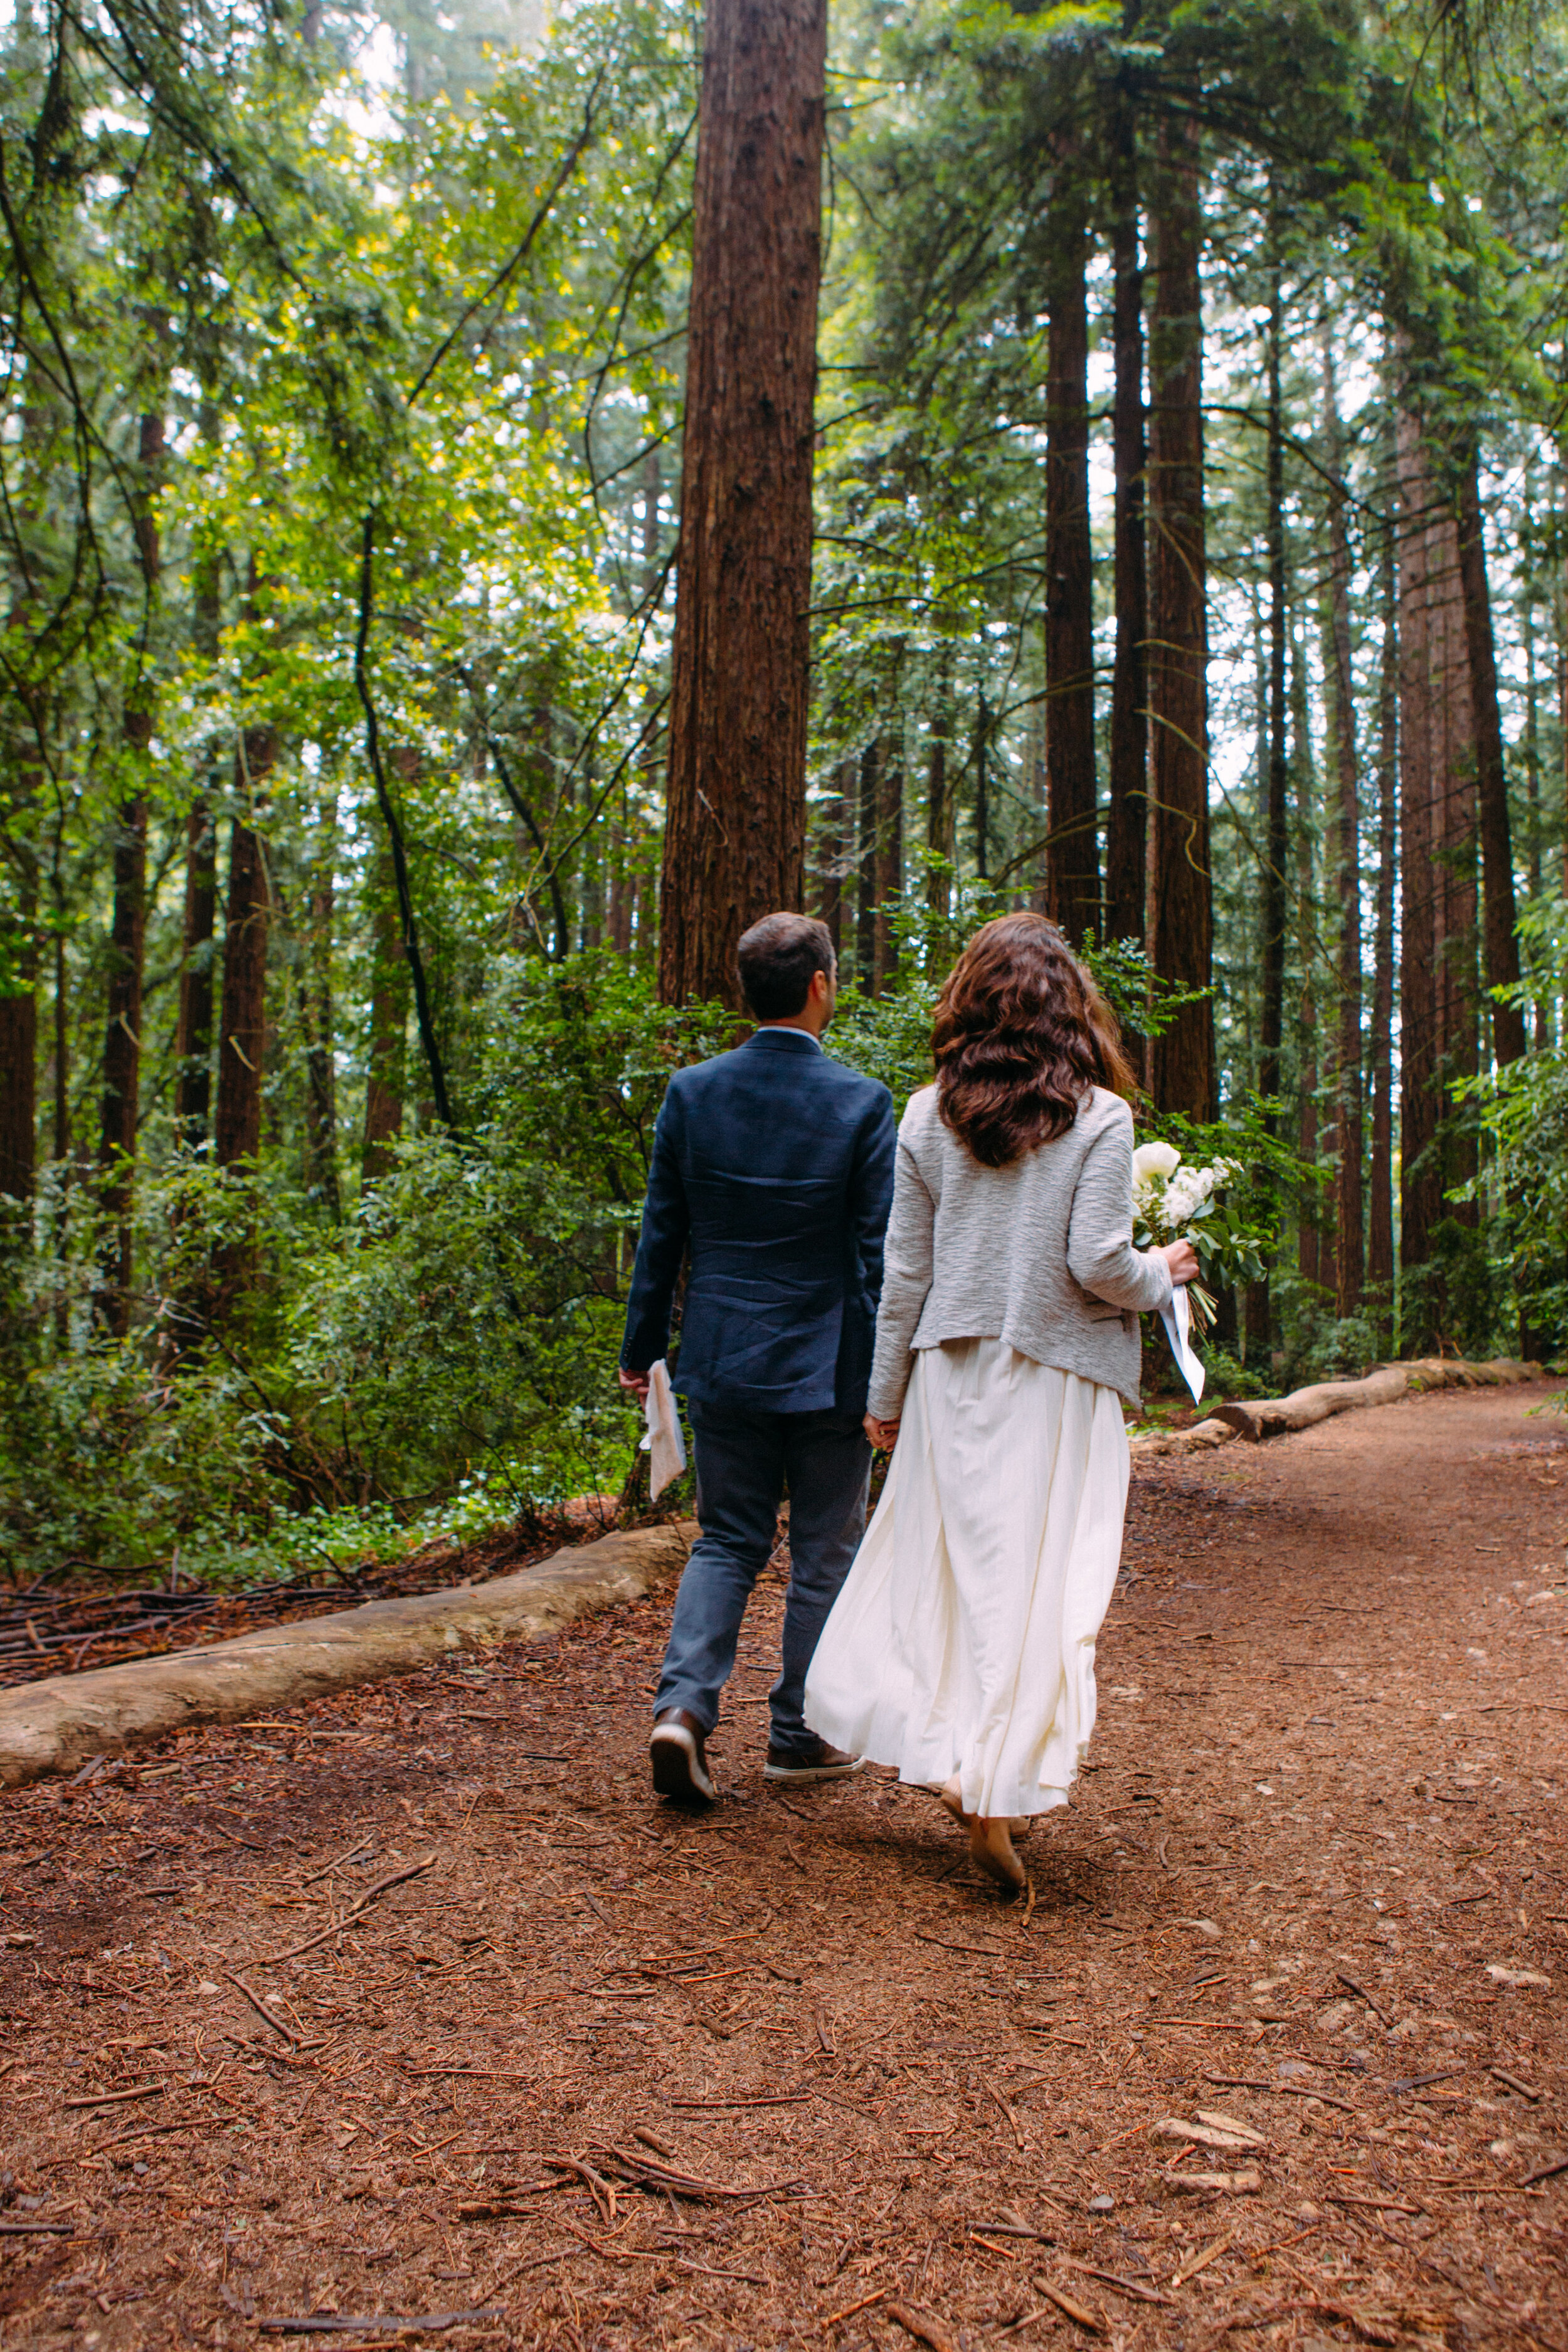 20190716-San Francisco-Redwood Regional Park-Marcella Daniele--5.jpg